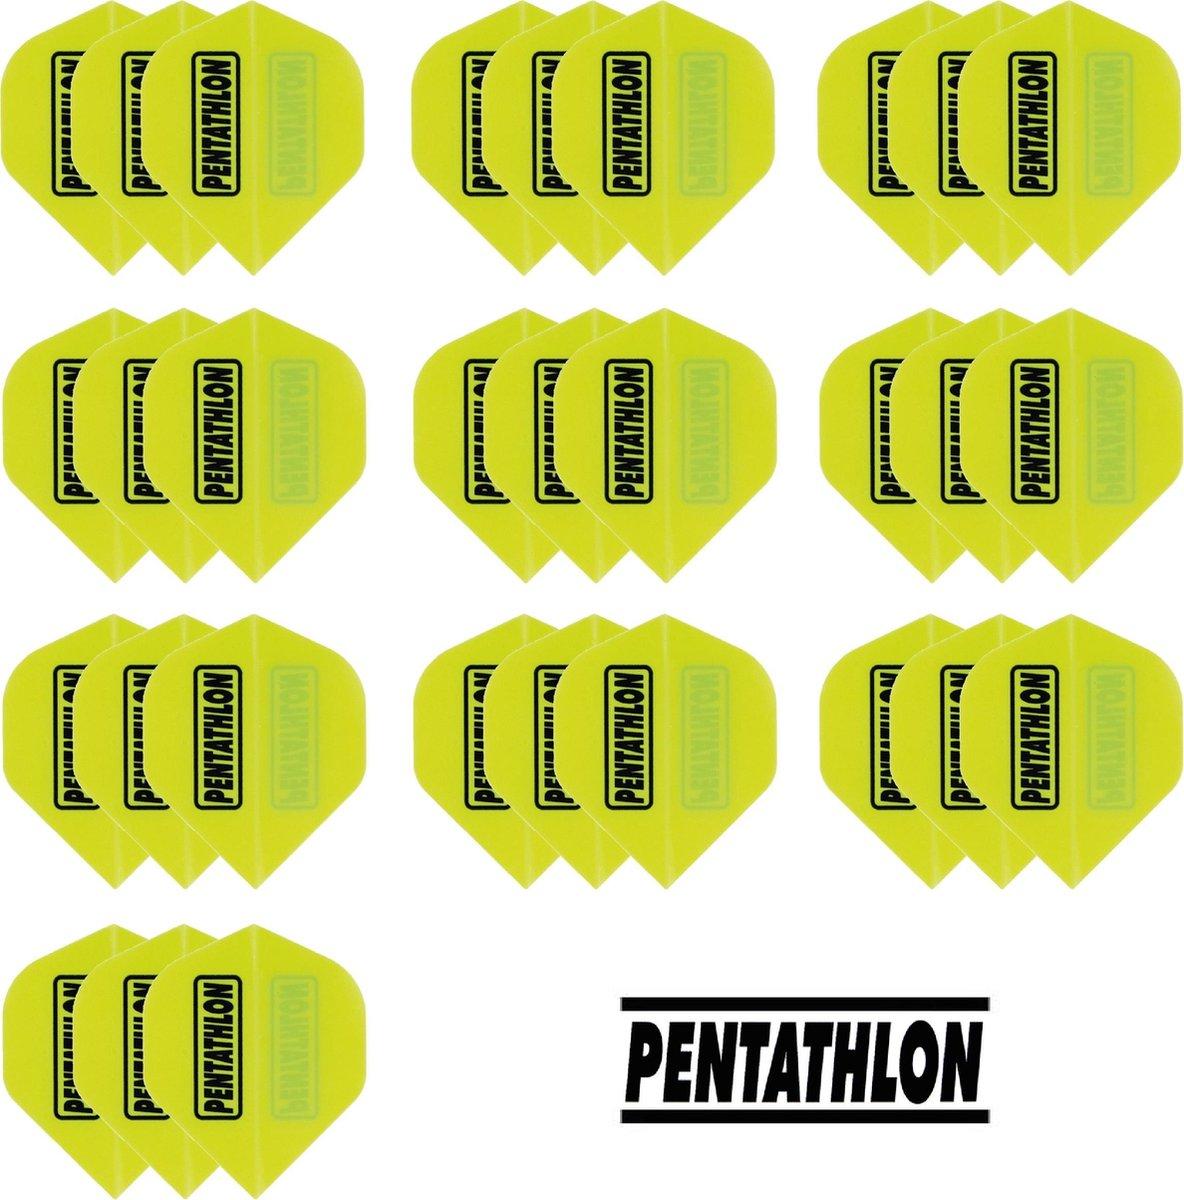 deDartshop 10 Sets (30 stuks) Pentathlon flights Multipack - Geel